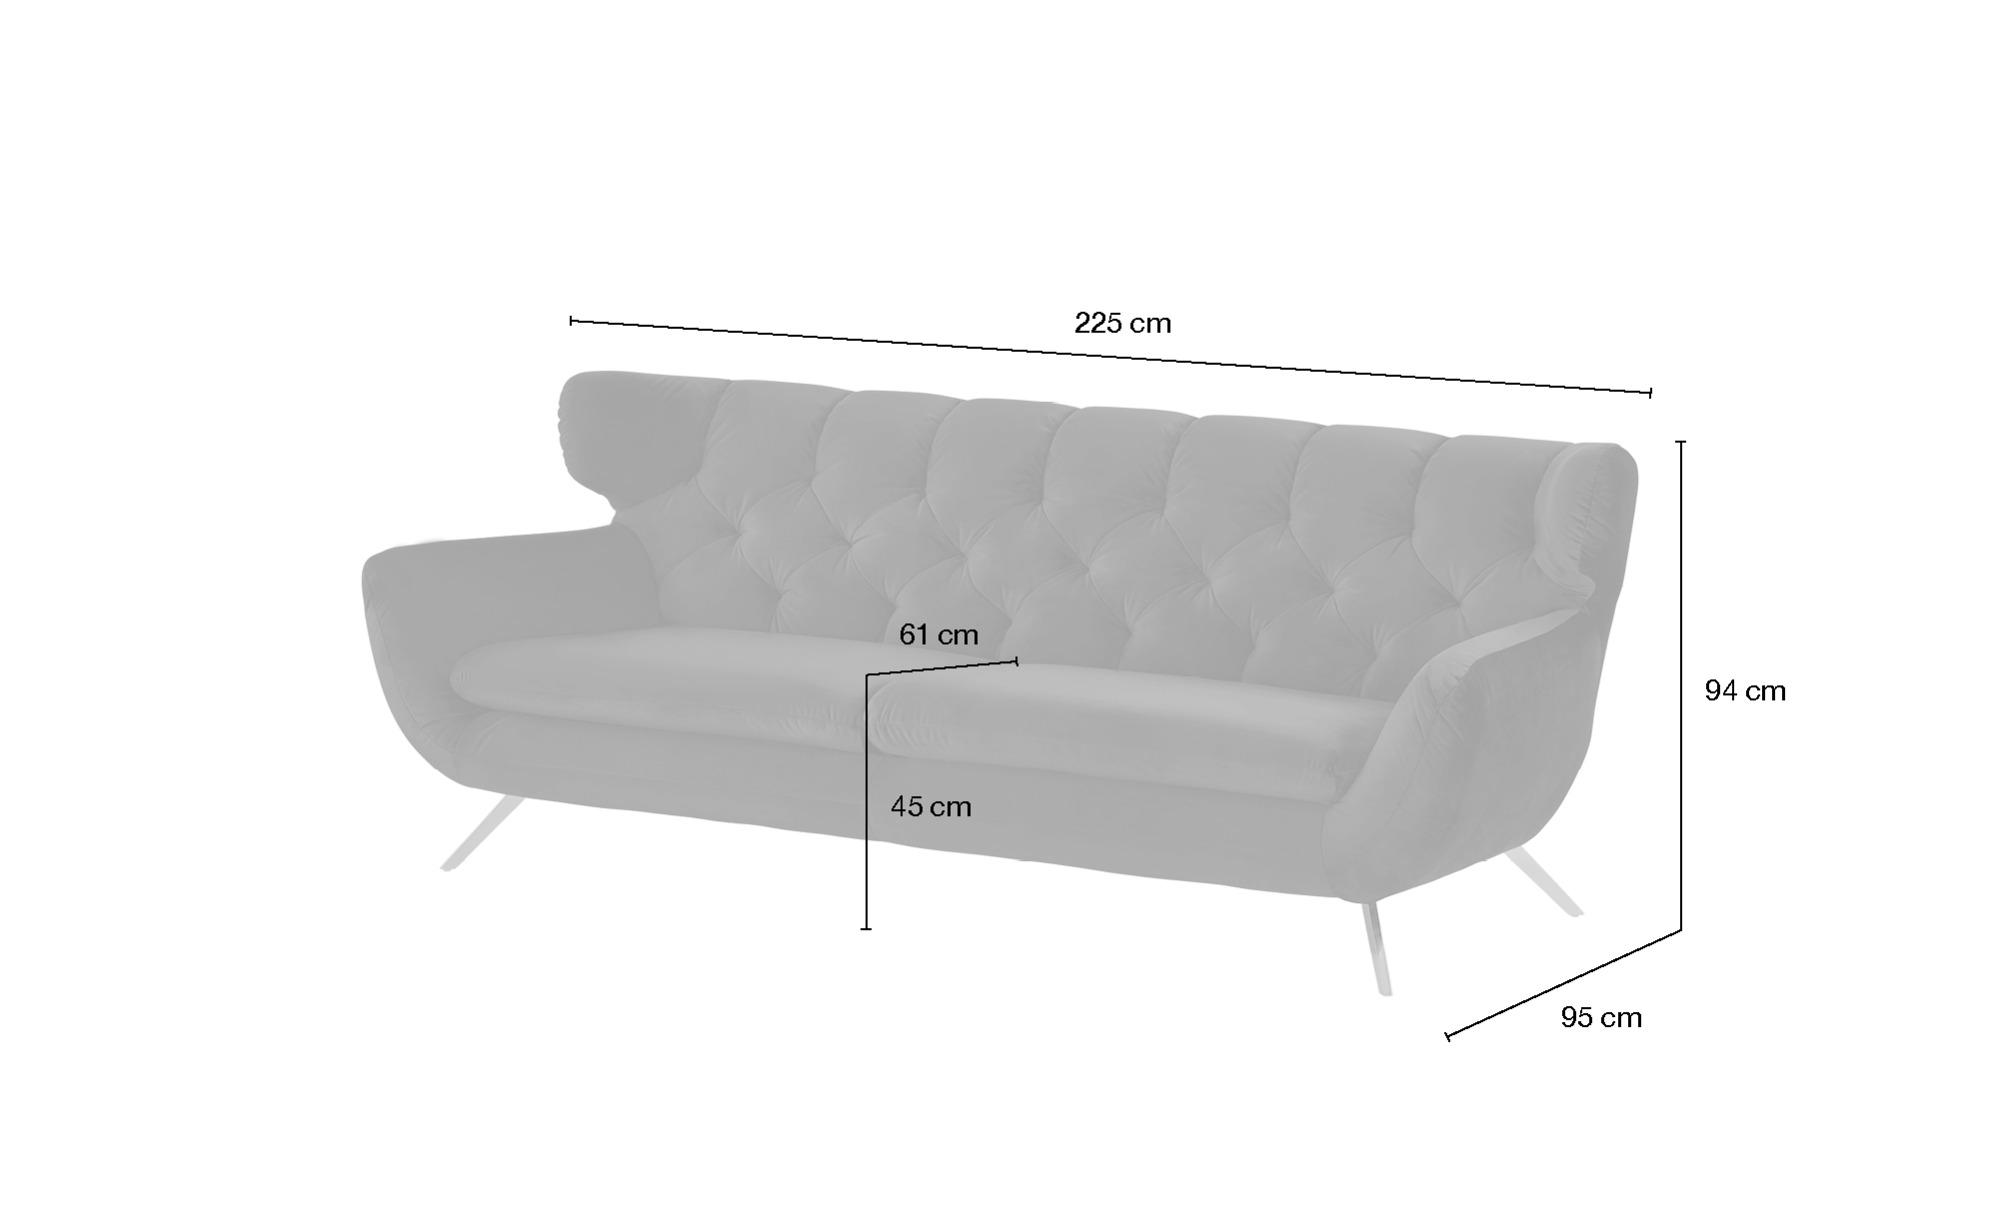 Sofa  Caldara ¦ grau ¦ Maße (cm): B: 225 H: 94 T: 95 Polstermöbel > Sofas > 3-Sitzer - Höffner